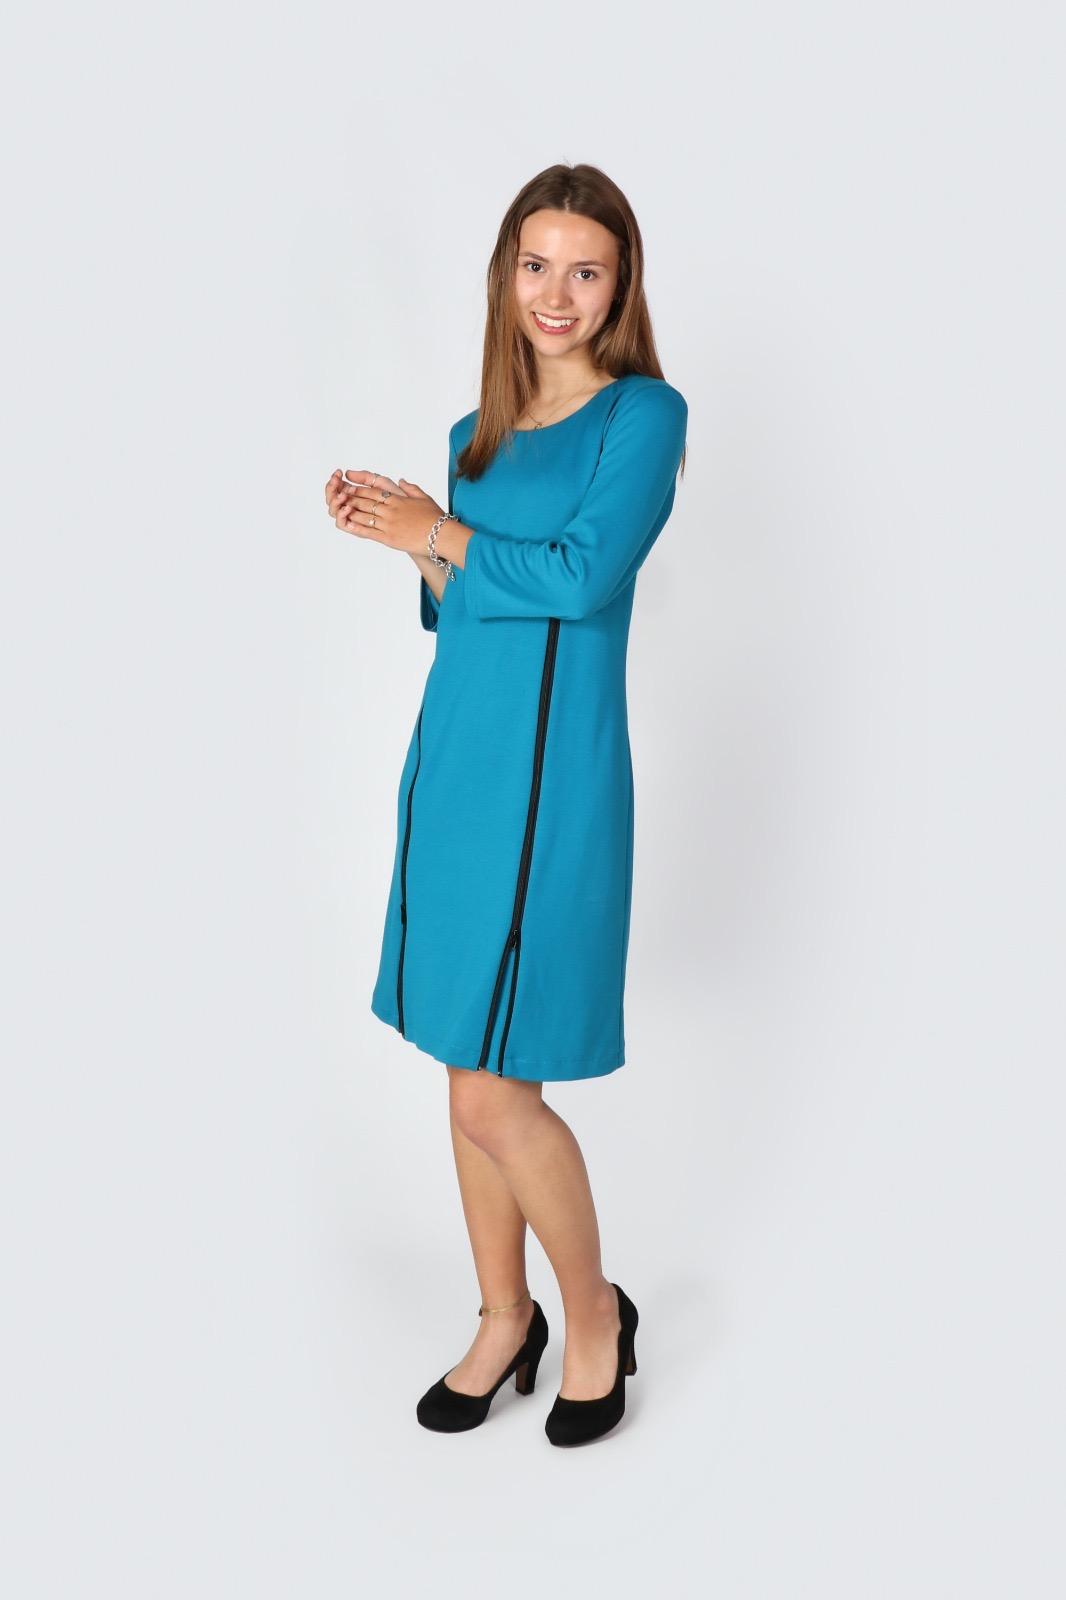 Kleid St Tropez Turkis Simple Dress Tanja Muller